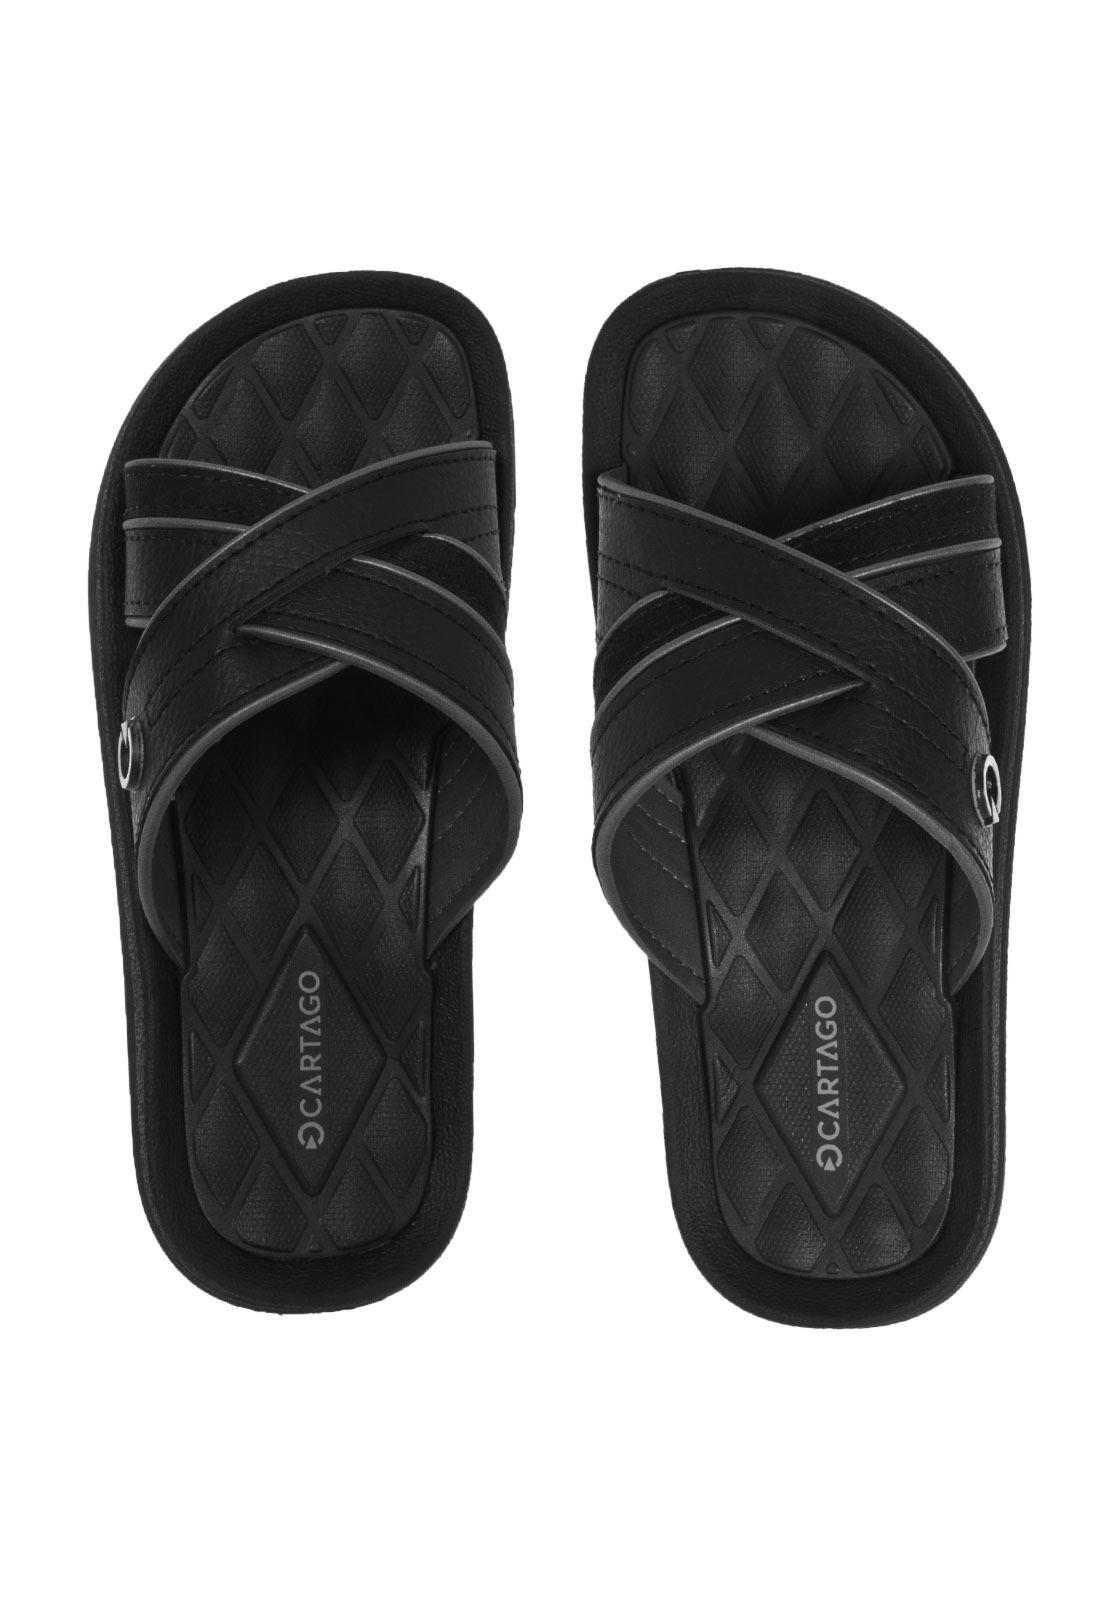 Sandália Cartago Fiji II Slide Preto - Compre Agora   Dafiti   Moda ... 6d1762f2d7